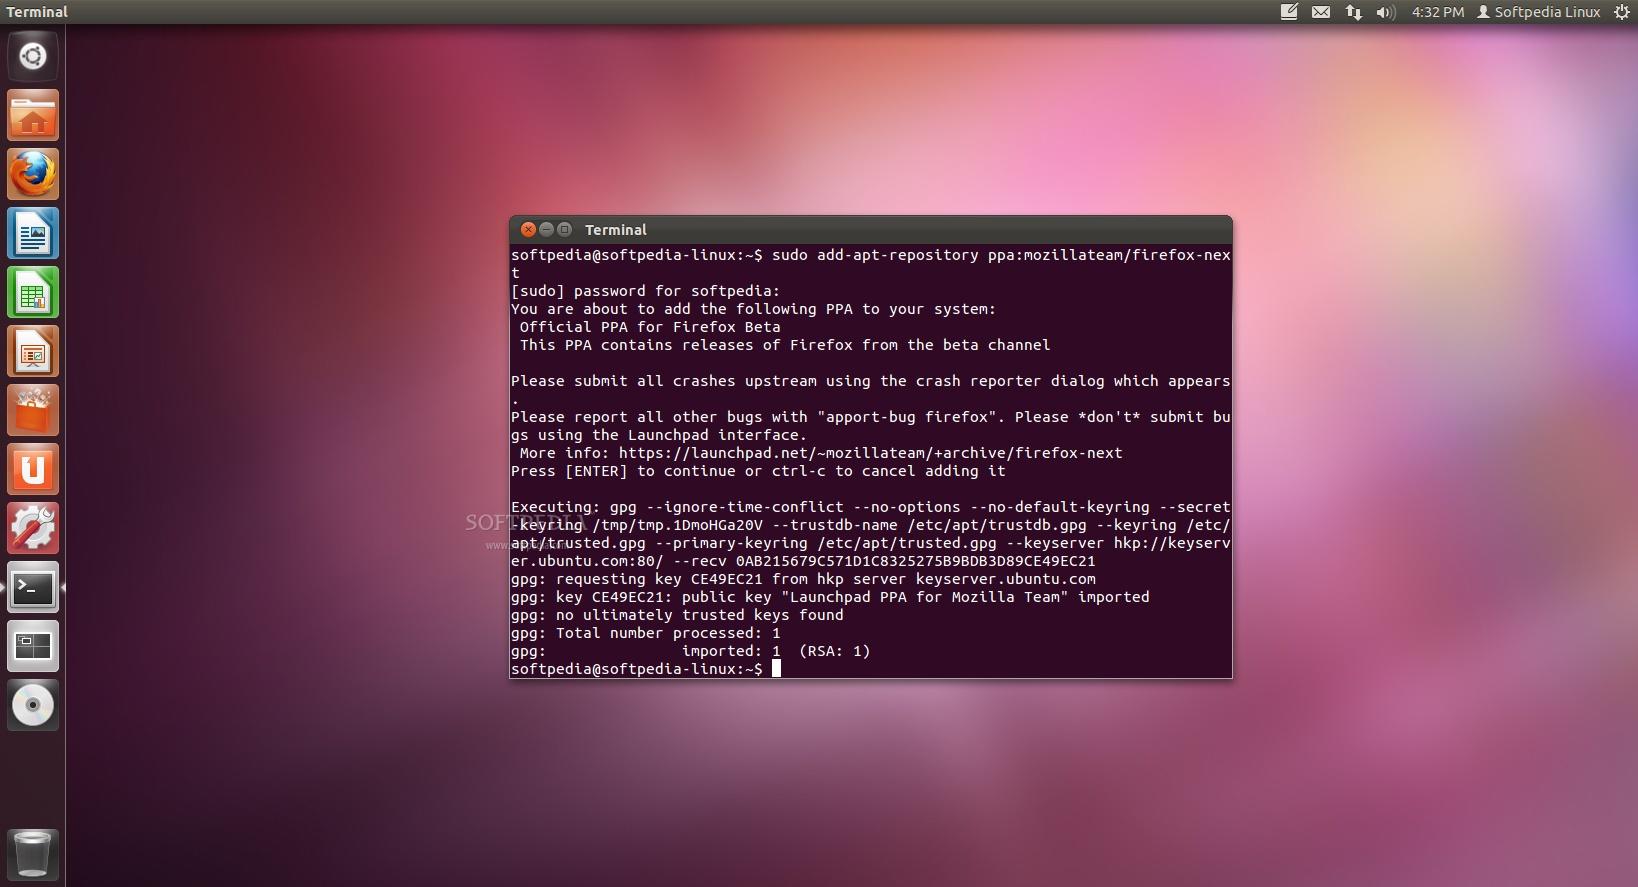 How to Install Firefox 11 in Ubuntu